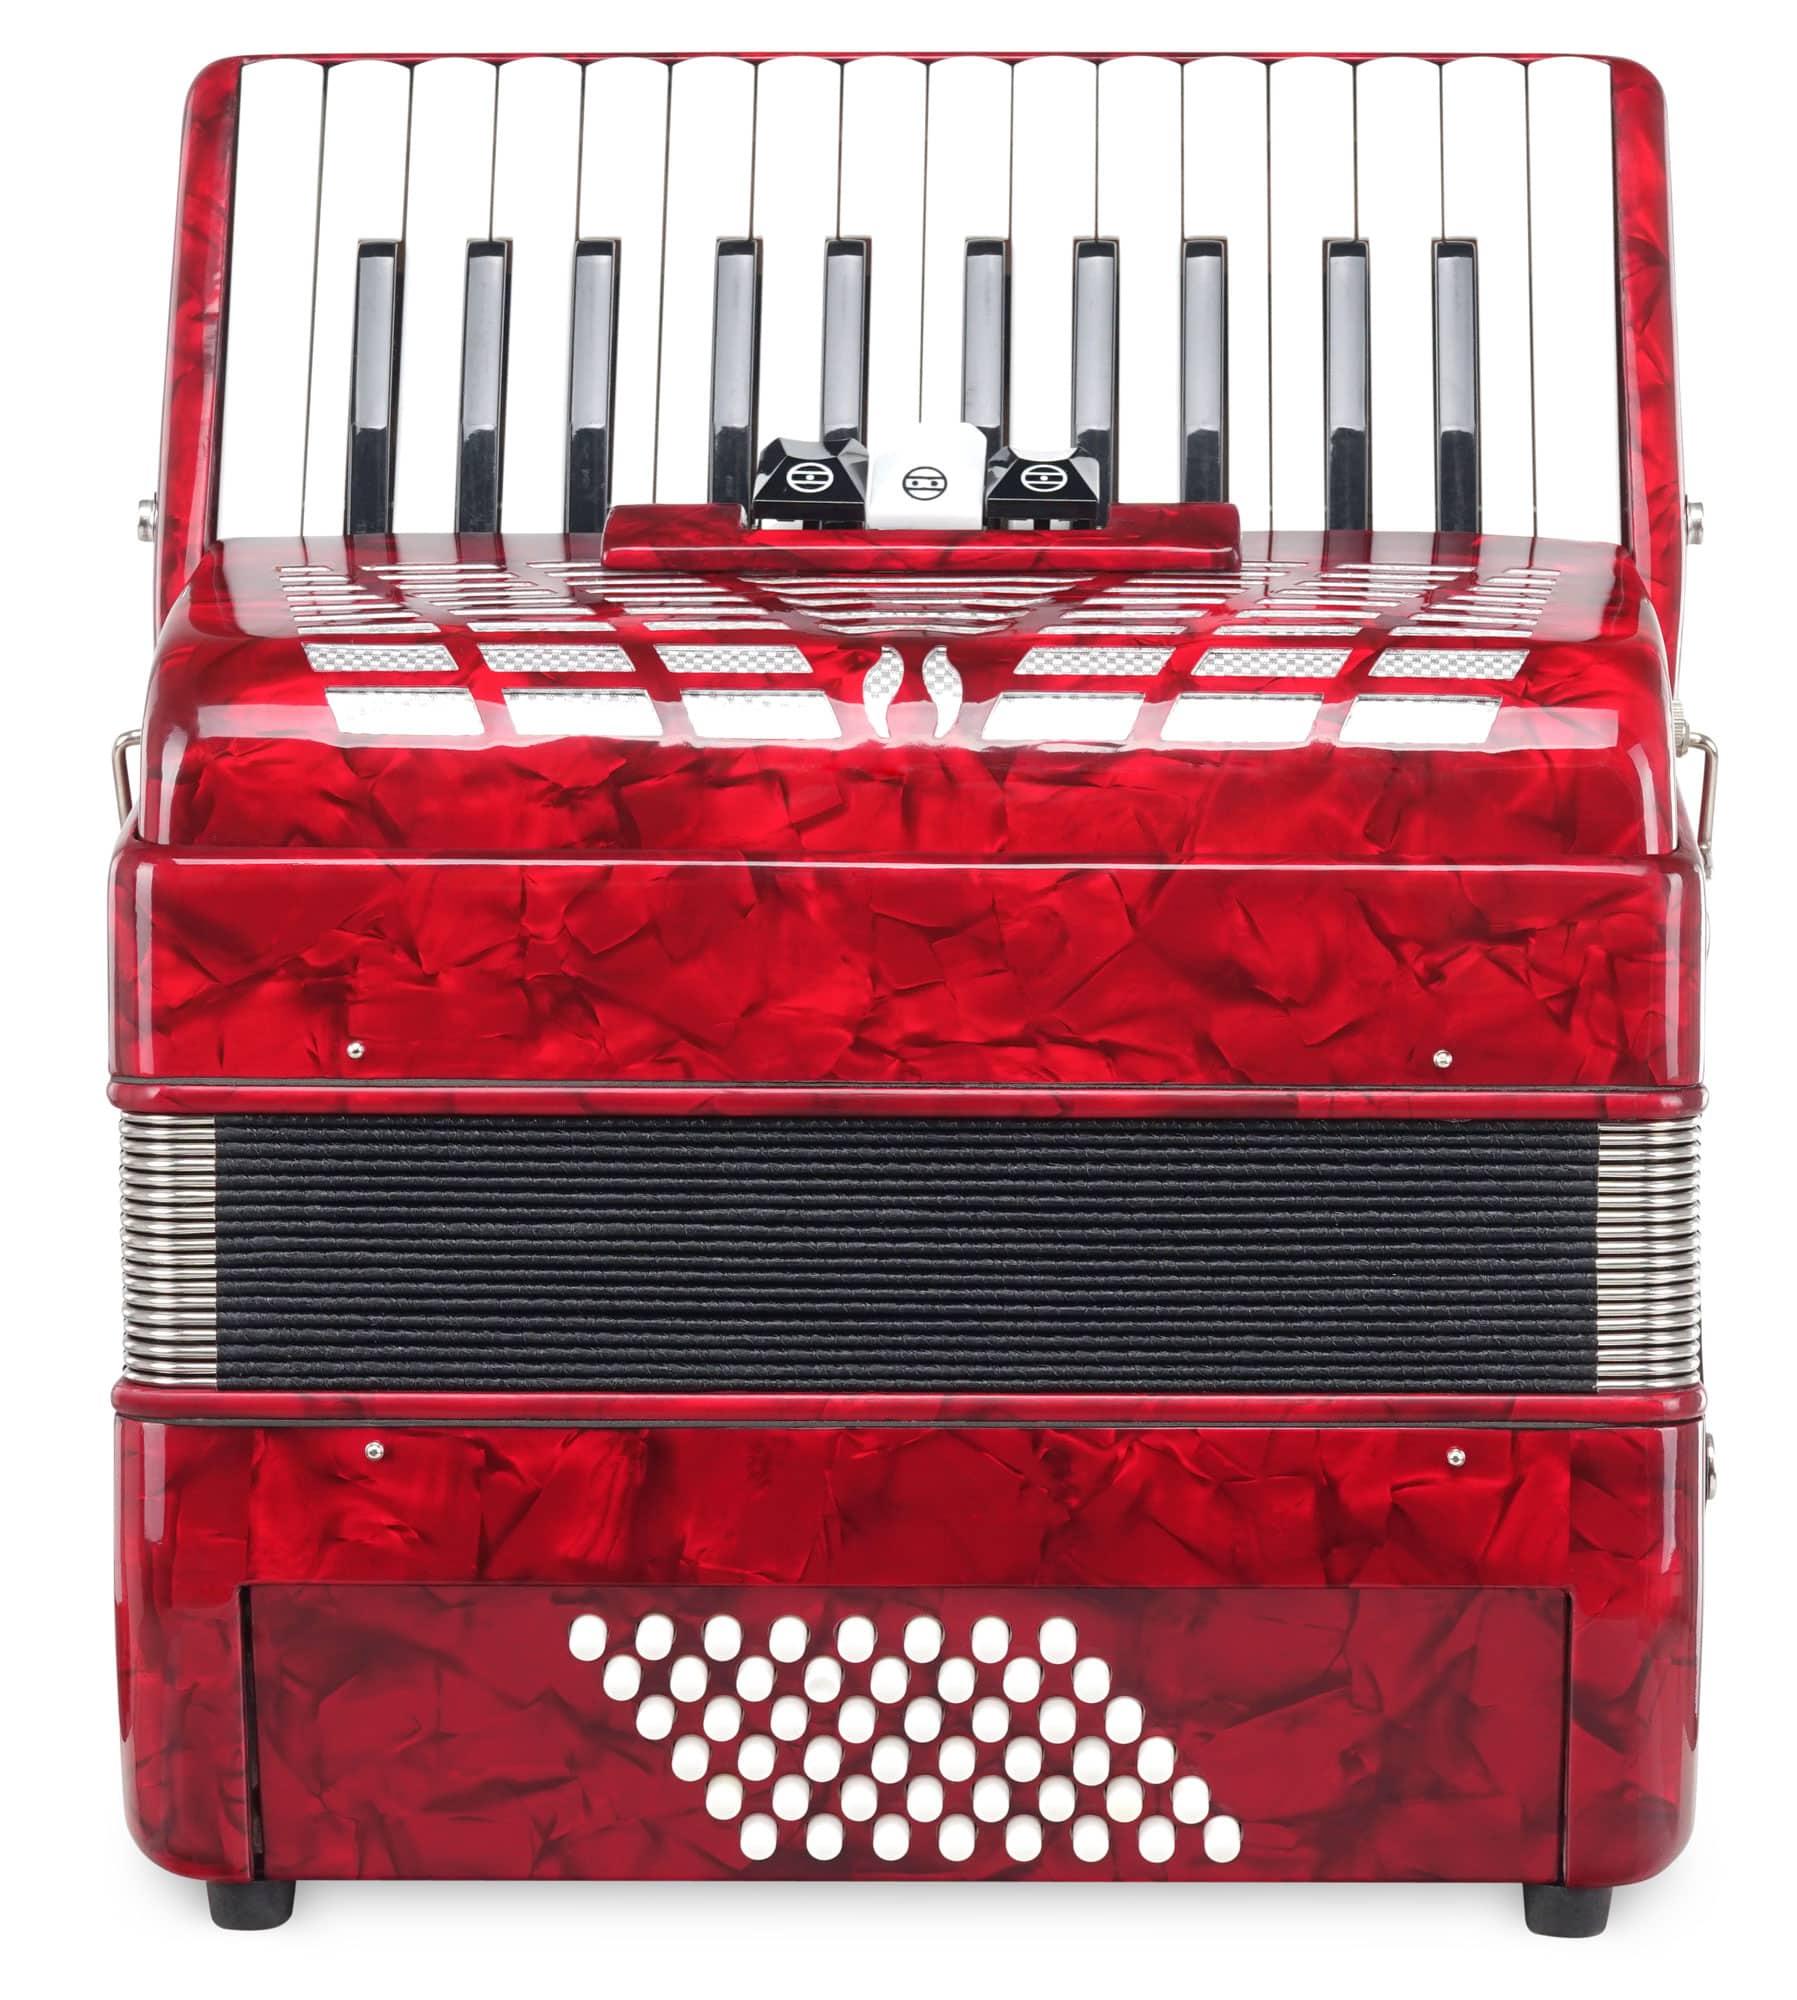 Akkordeons - Classic Cantabile 48 Bass Akkordeon 'Secondo III' rot B Ware - Onlineshop Musikhaus Kirstein